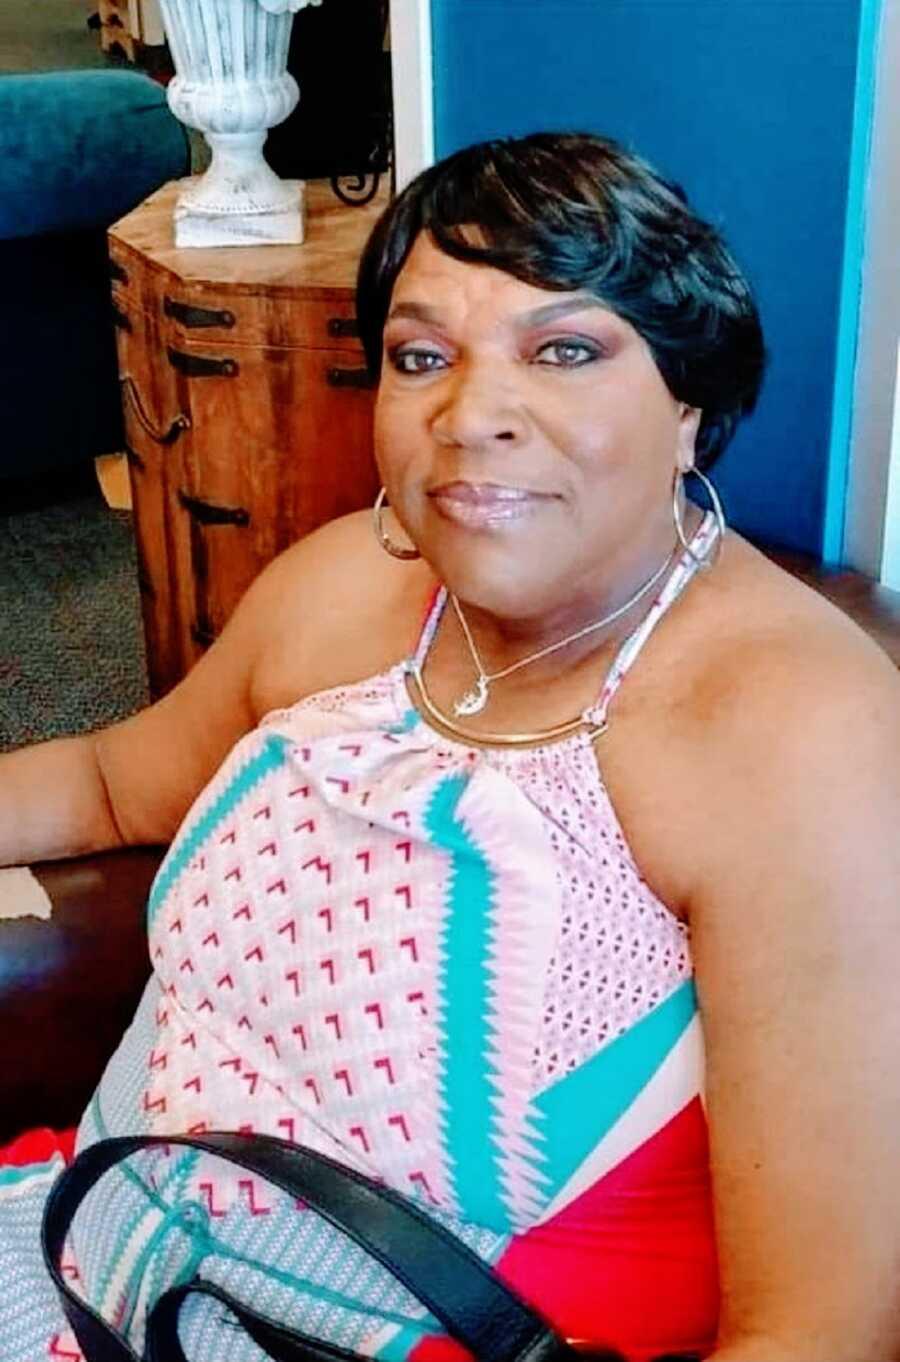 Woman seated wearing pink tank top